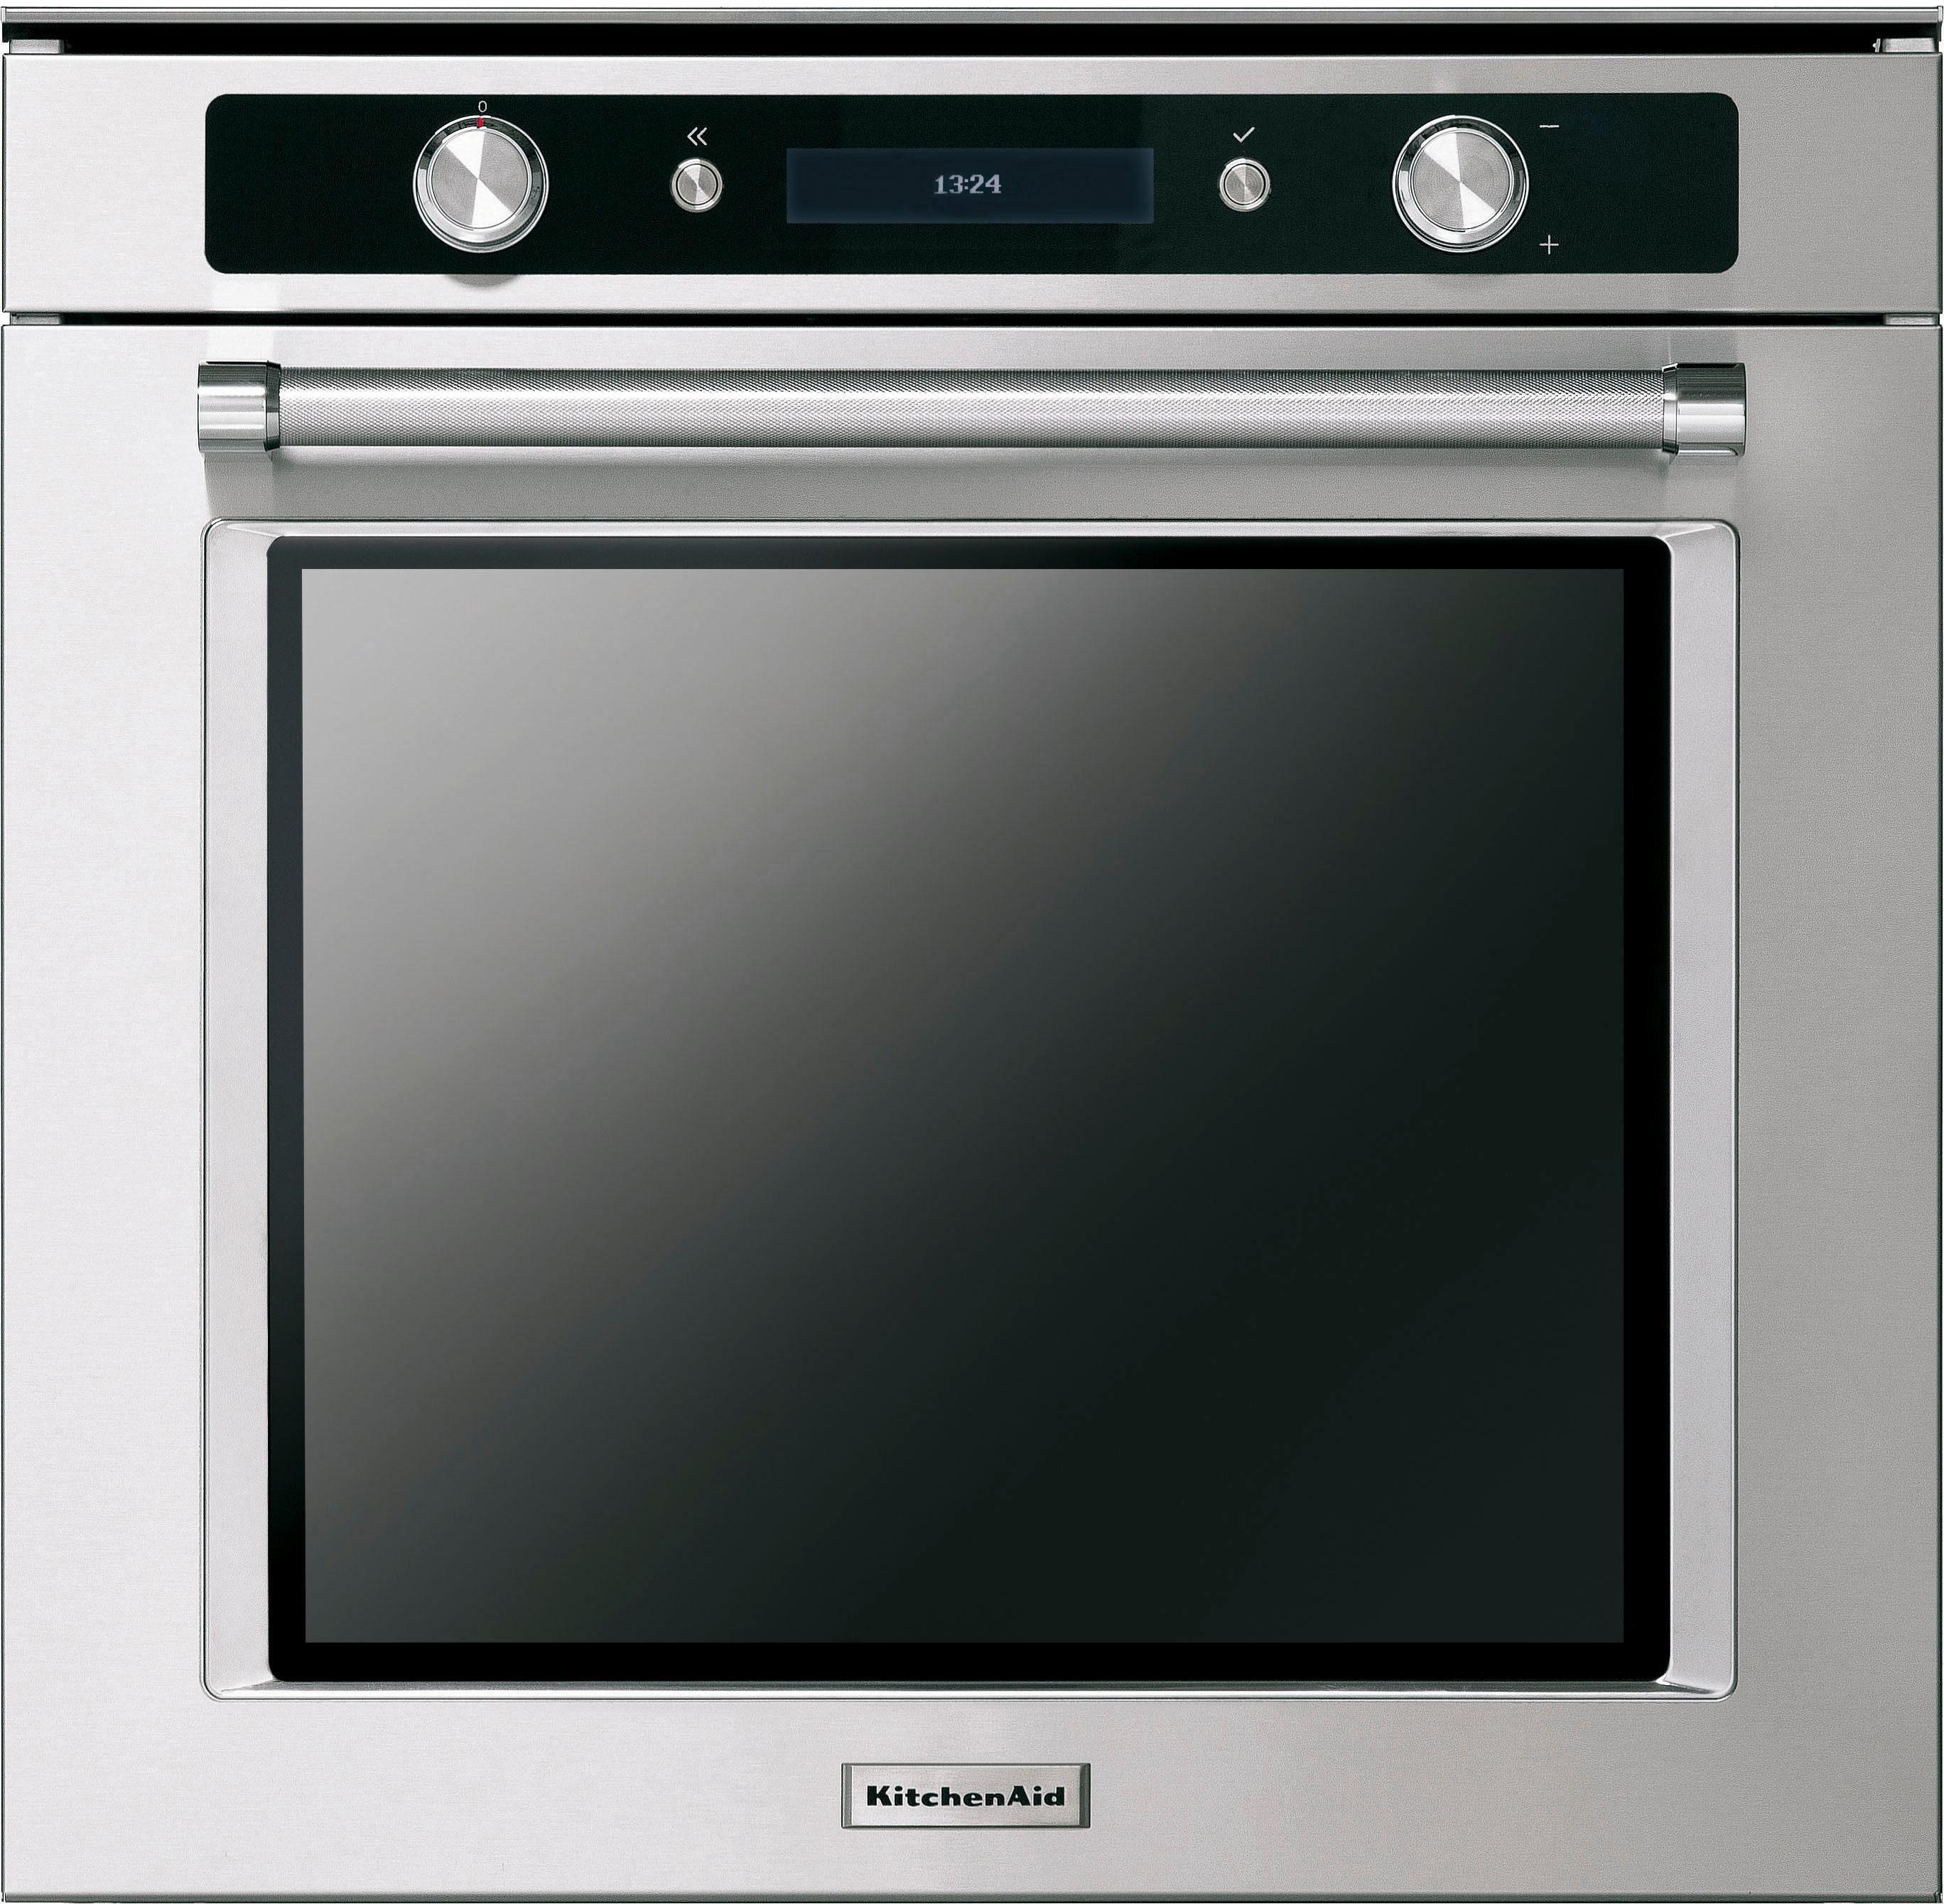 KitchenAid® Backofen KOHSS 60601, Energieklasse A+